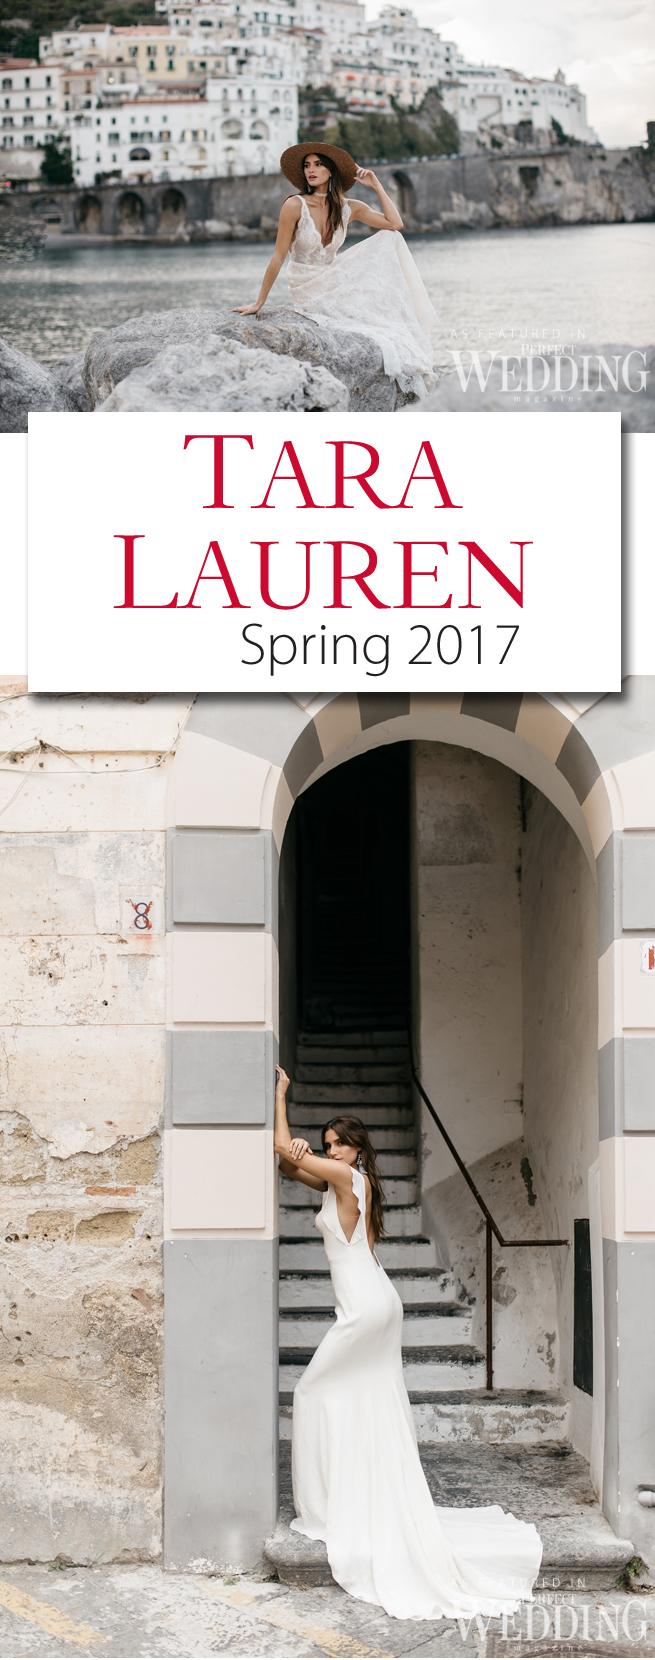 Tara Lauren Bridal, destination wedding Dresses, Tara Lauren, Perfect Wedding Magazine, Spring 2017, Spring 2017 Bridal, Amalfi Coast,